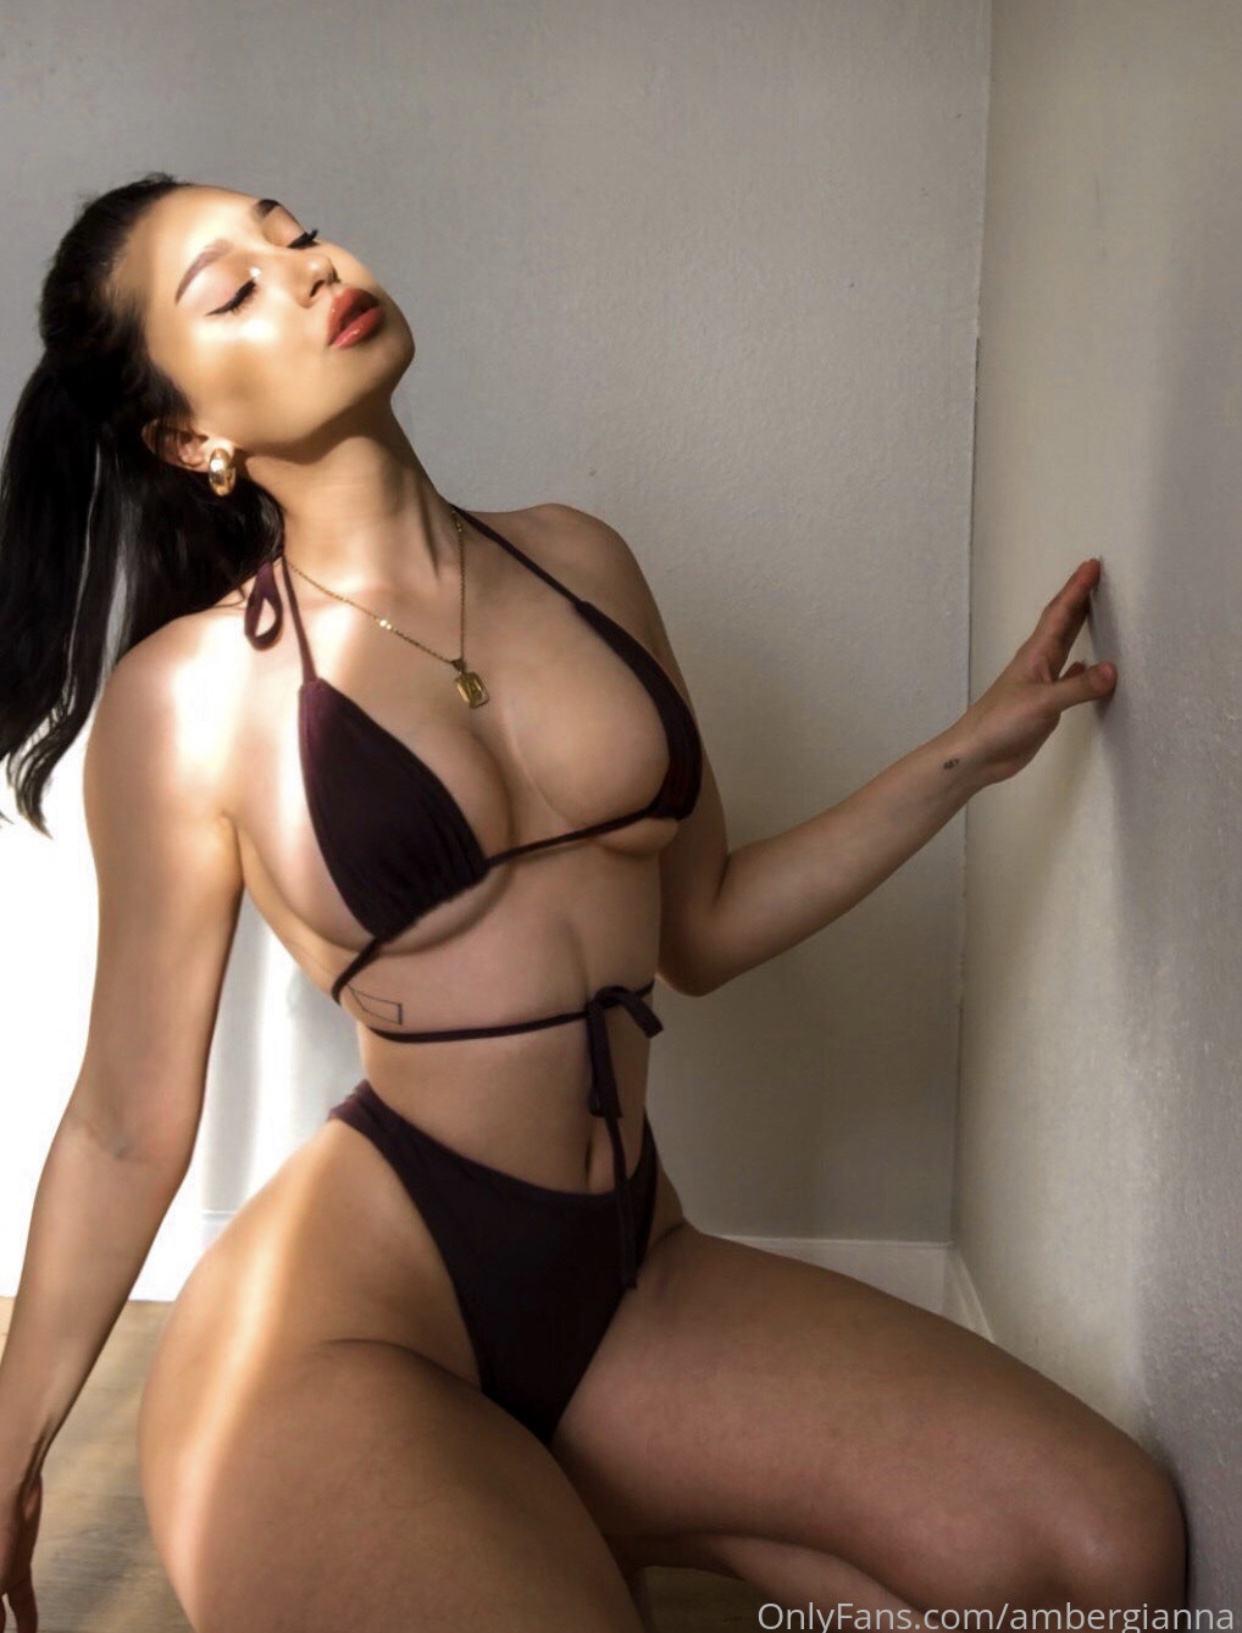 Amber Gianna Leaked 0120